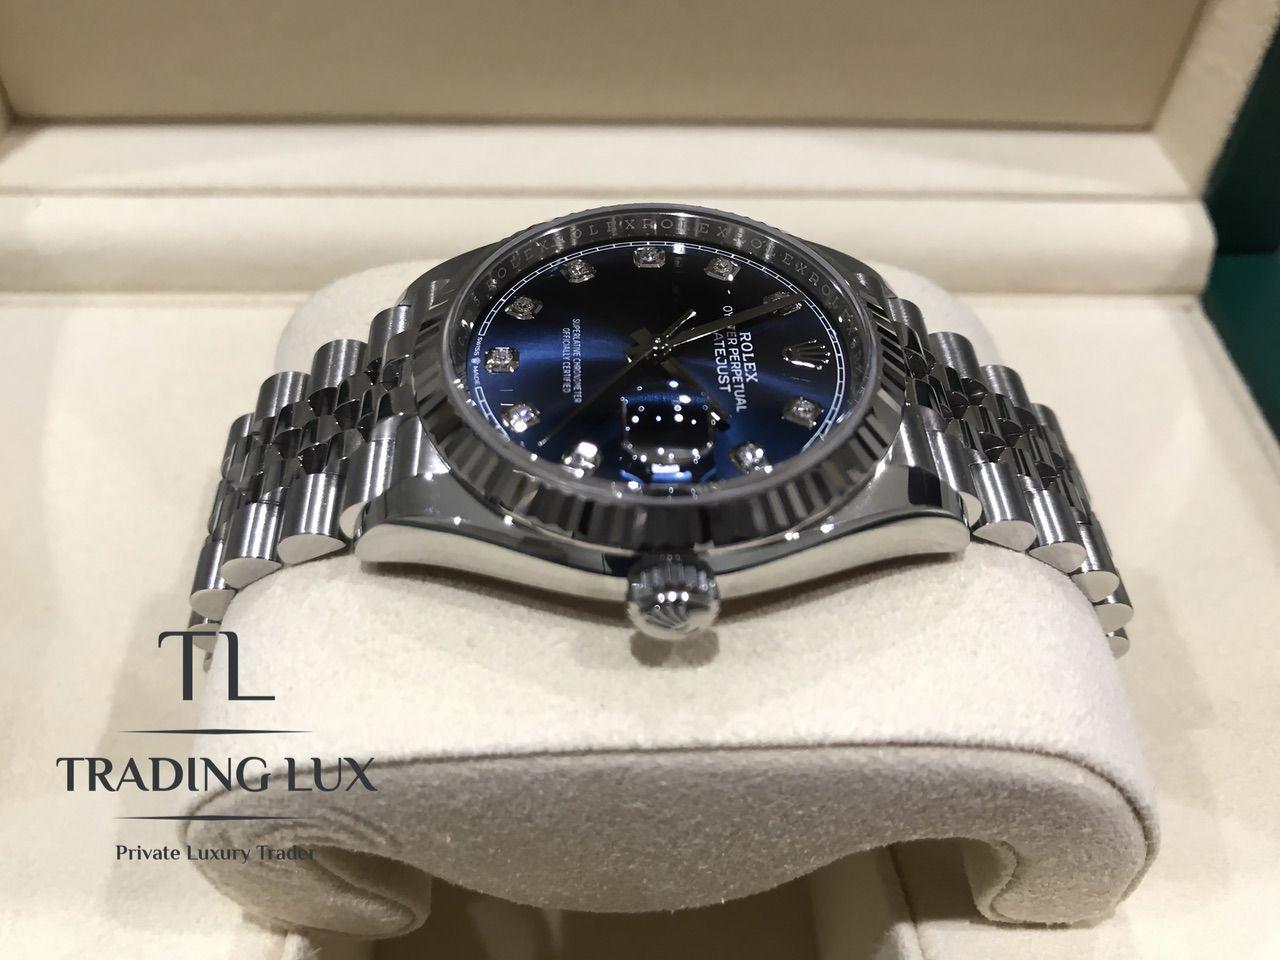 Rolex-Datejust-126234-0